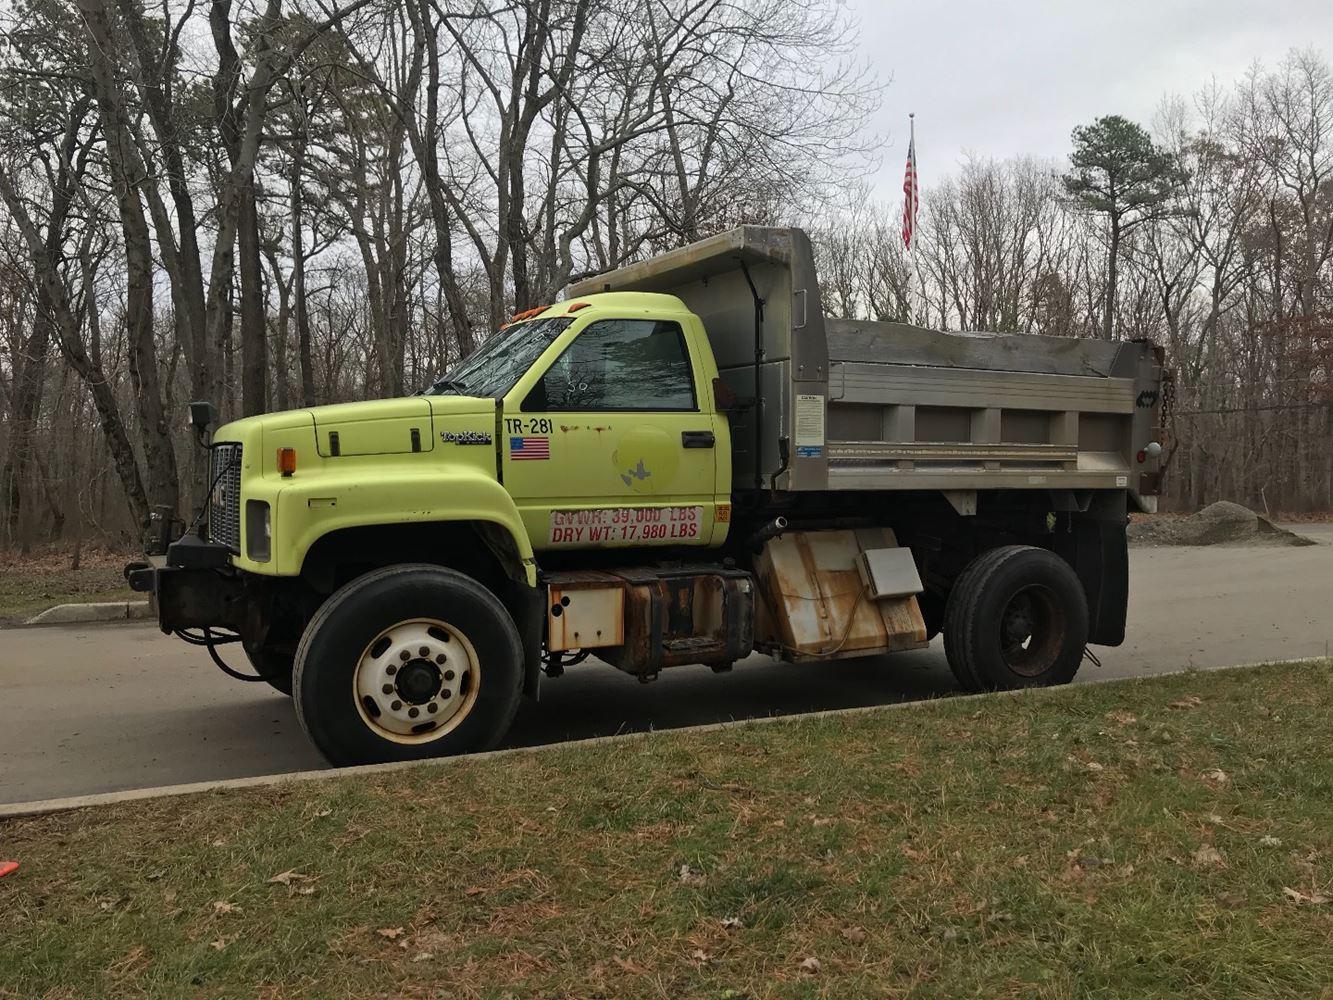 1995 Gmc C7000 Topkick Tpi Chevy Kodiak Dump Truck 30 November 2018 Image Subject To Change